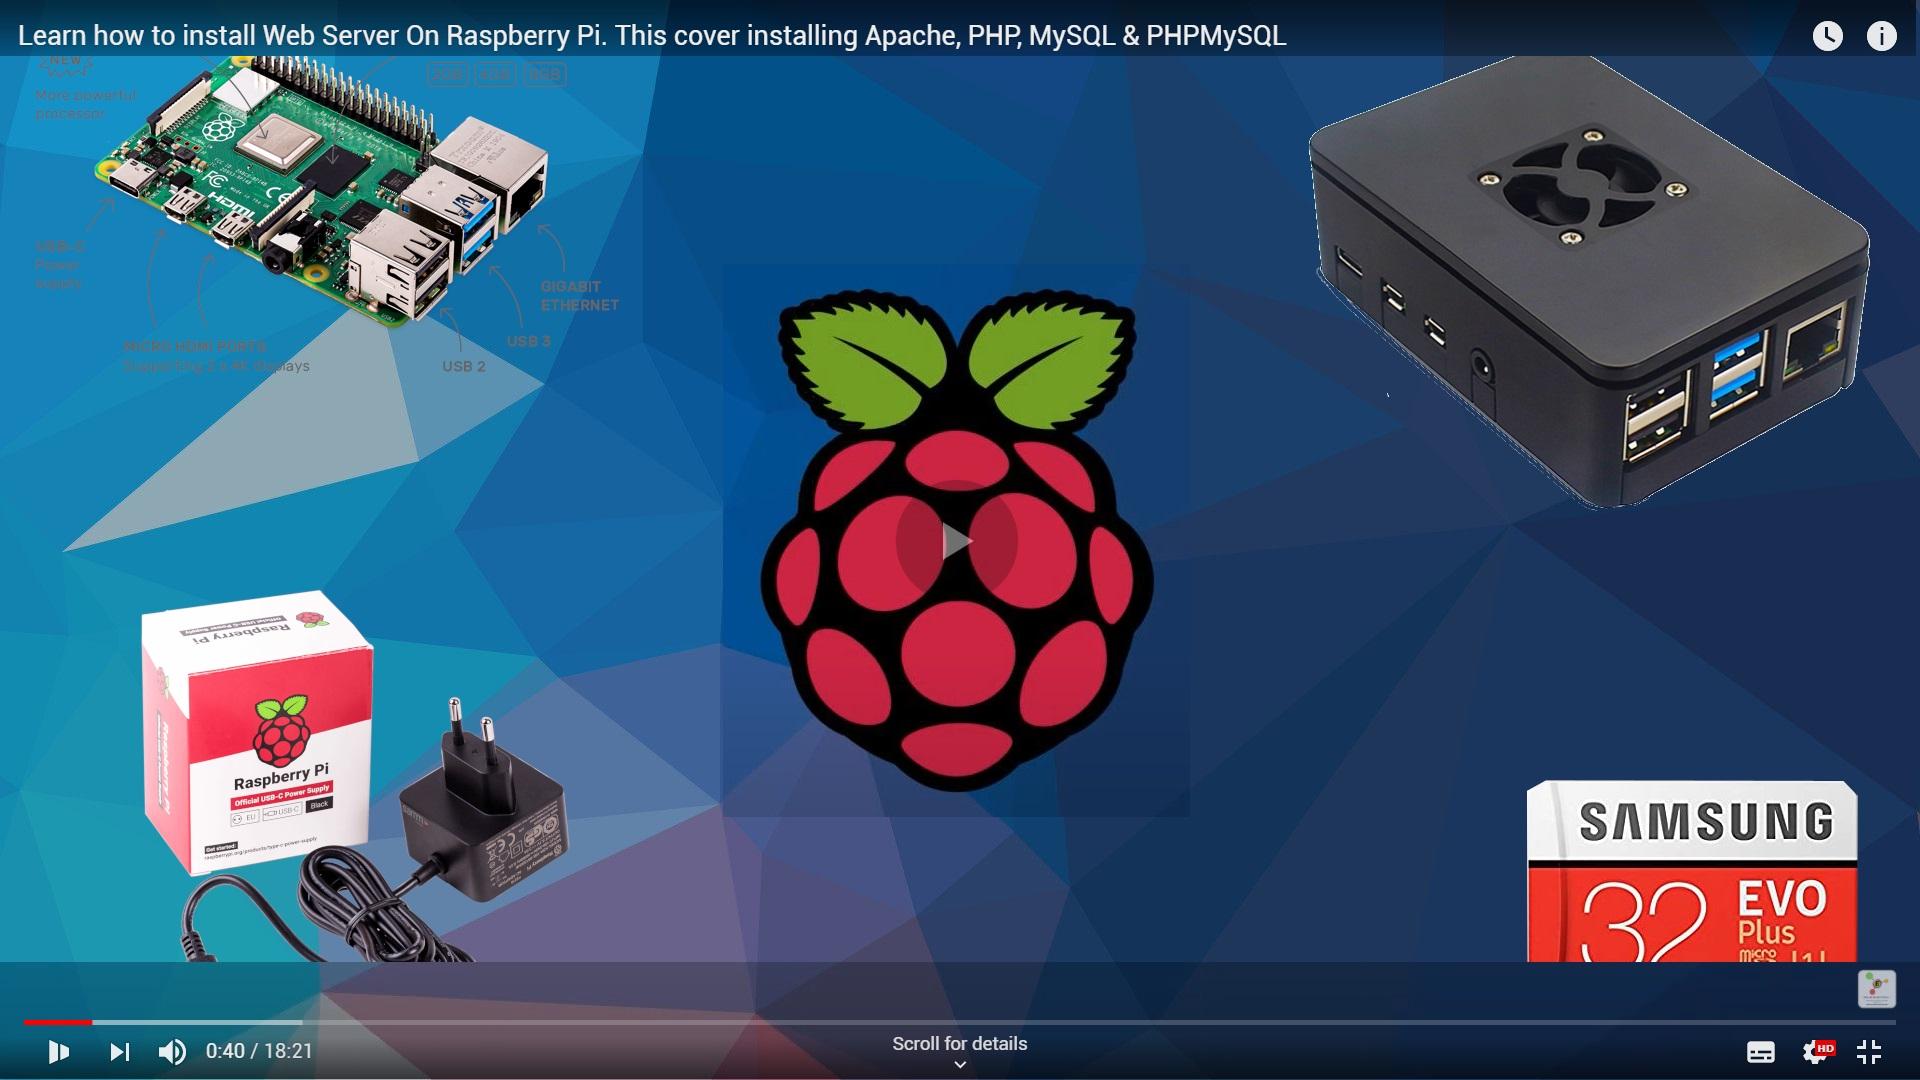 Learn How To Install Web Server On Raspberry Pi This Cover Installing Apache Php Mysql Phpmysql Github